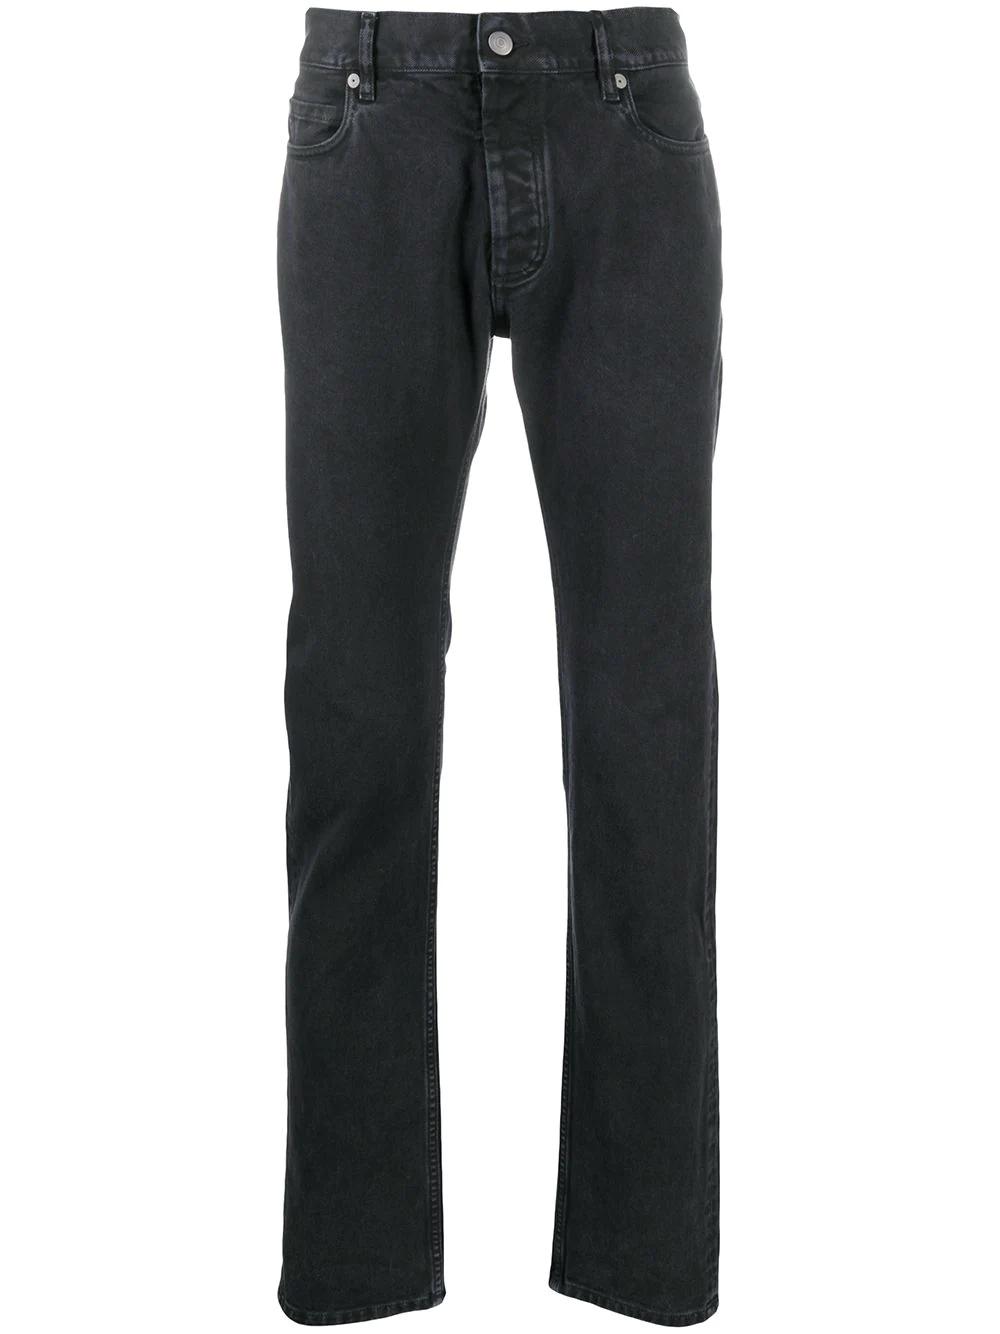 Maison Margiela | Maison Margiela узкие джинсы | Clouty